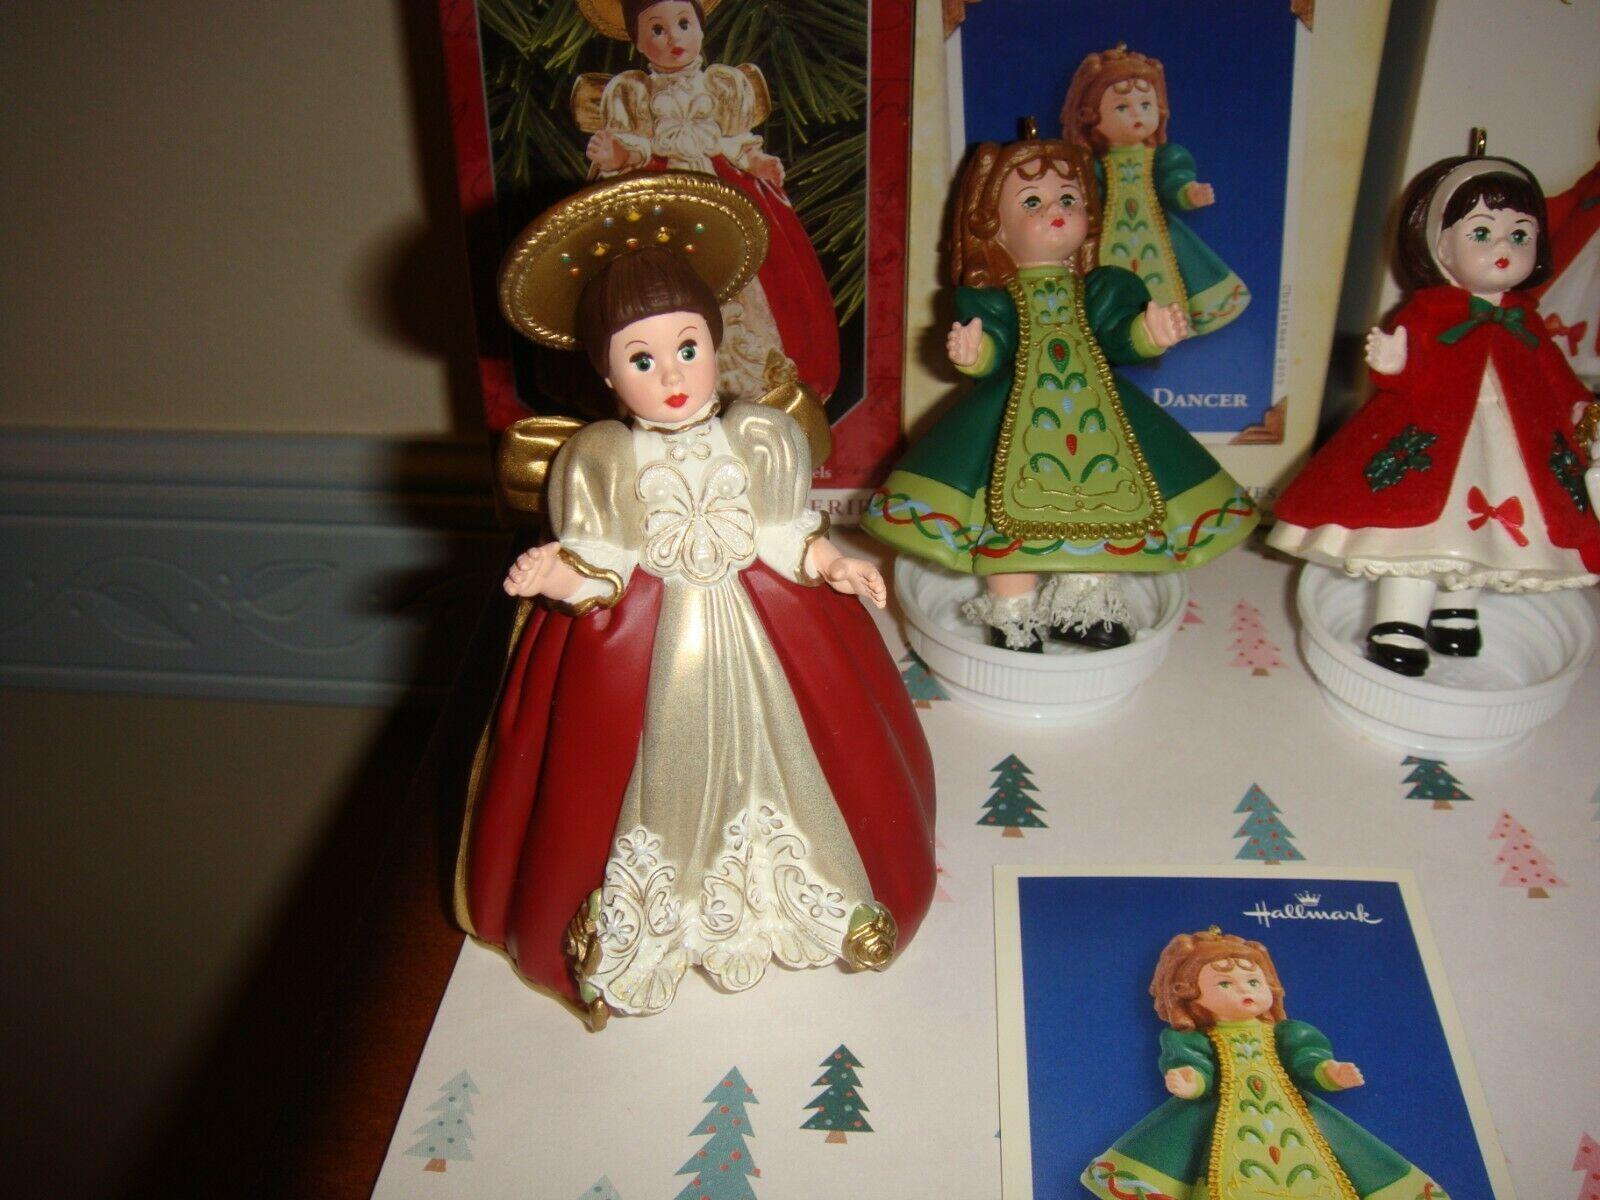 Hallmark 1998 05 06 11 & 13 Madame Alexander Series 01 10 11 16 & 18  Ornaments image 3